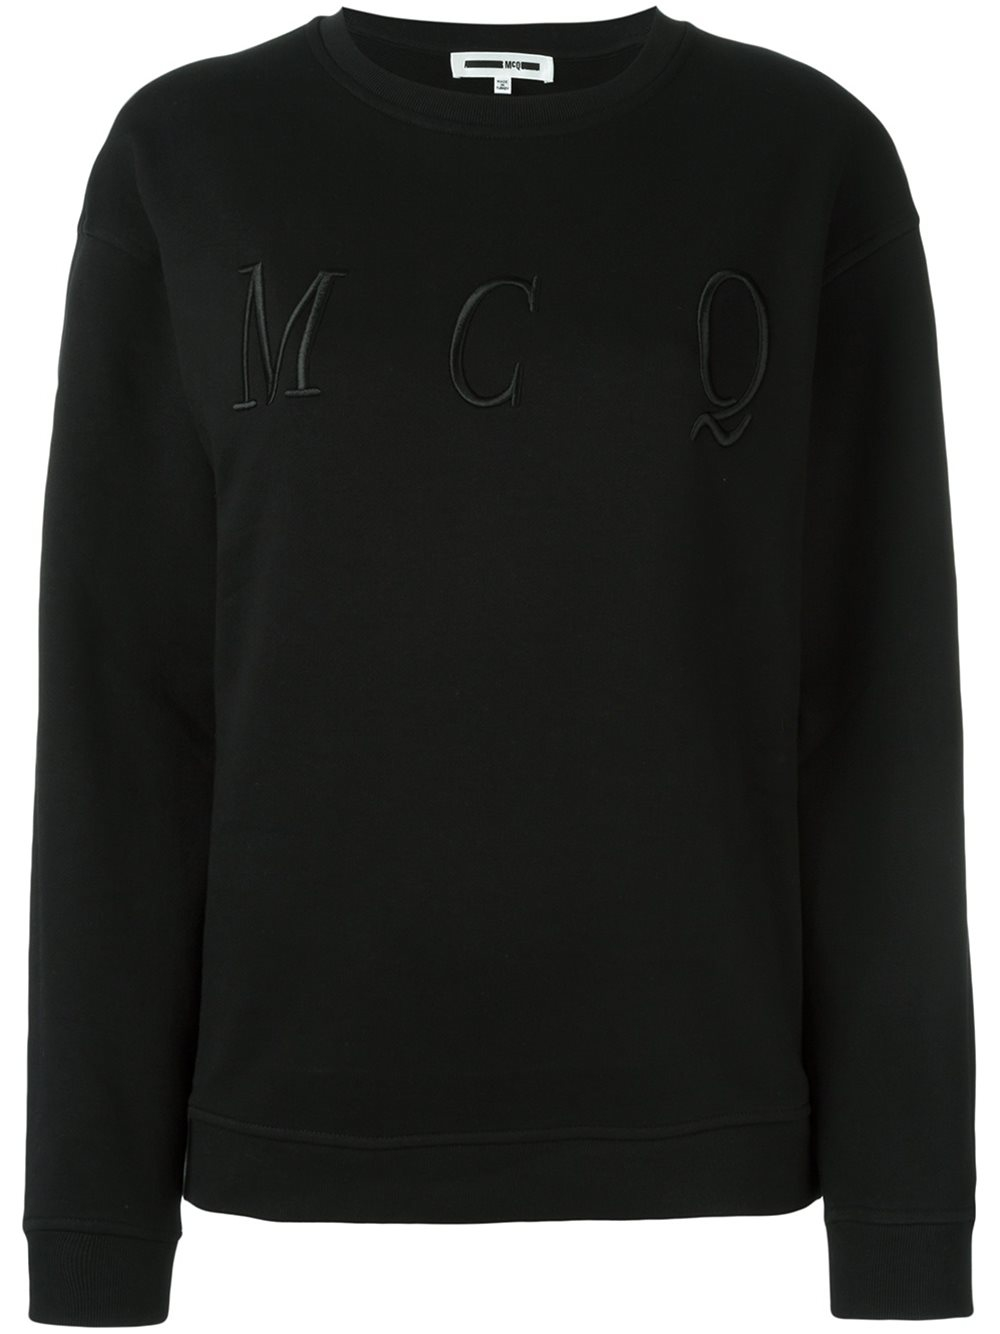 mcq alexander mcqueen embroidered logo sweatshirt in black lyst. Black Bedroom Furniture Sets. Home Design Ideas